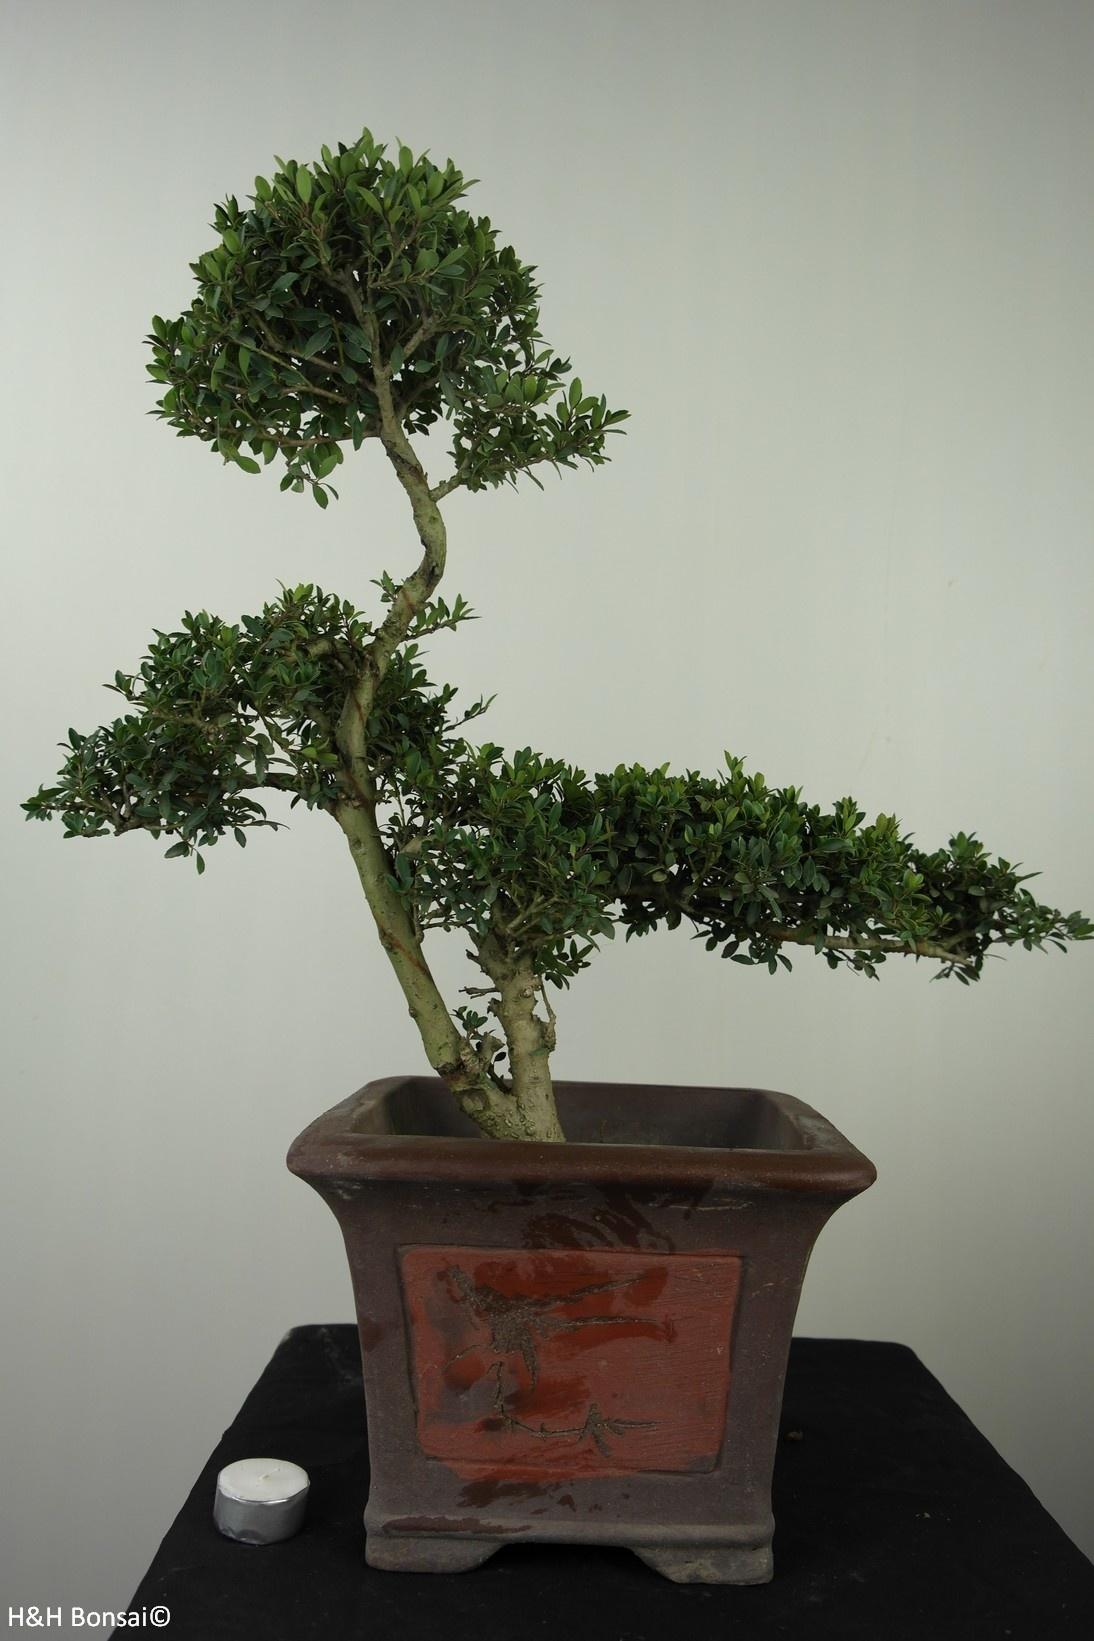 Bonsai Japanese Holly, Ilex crenata, no. 7746